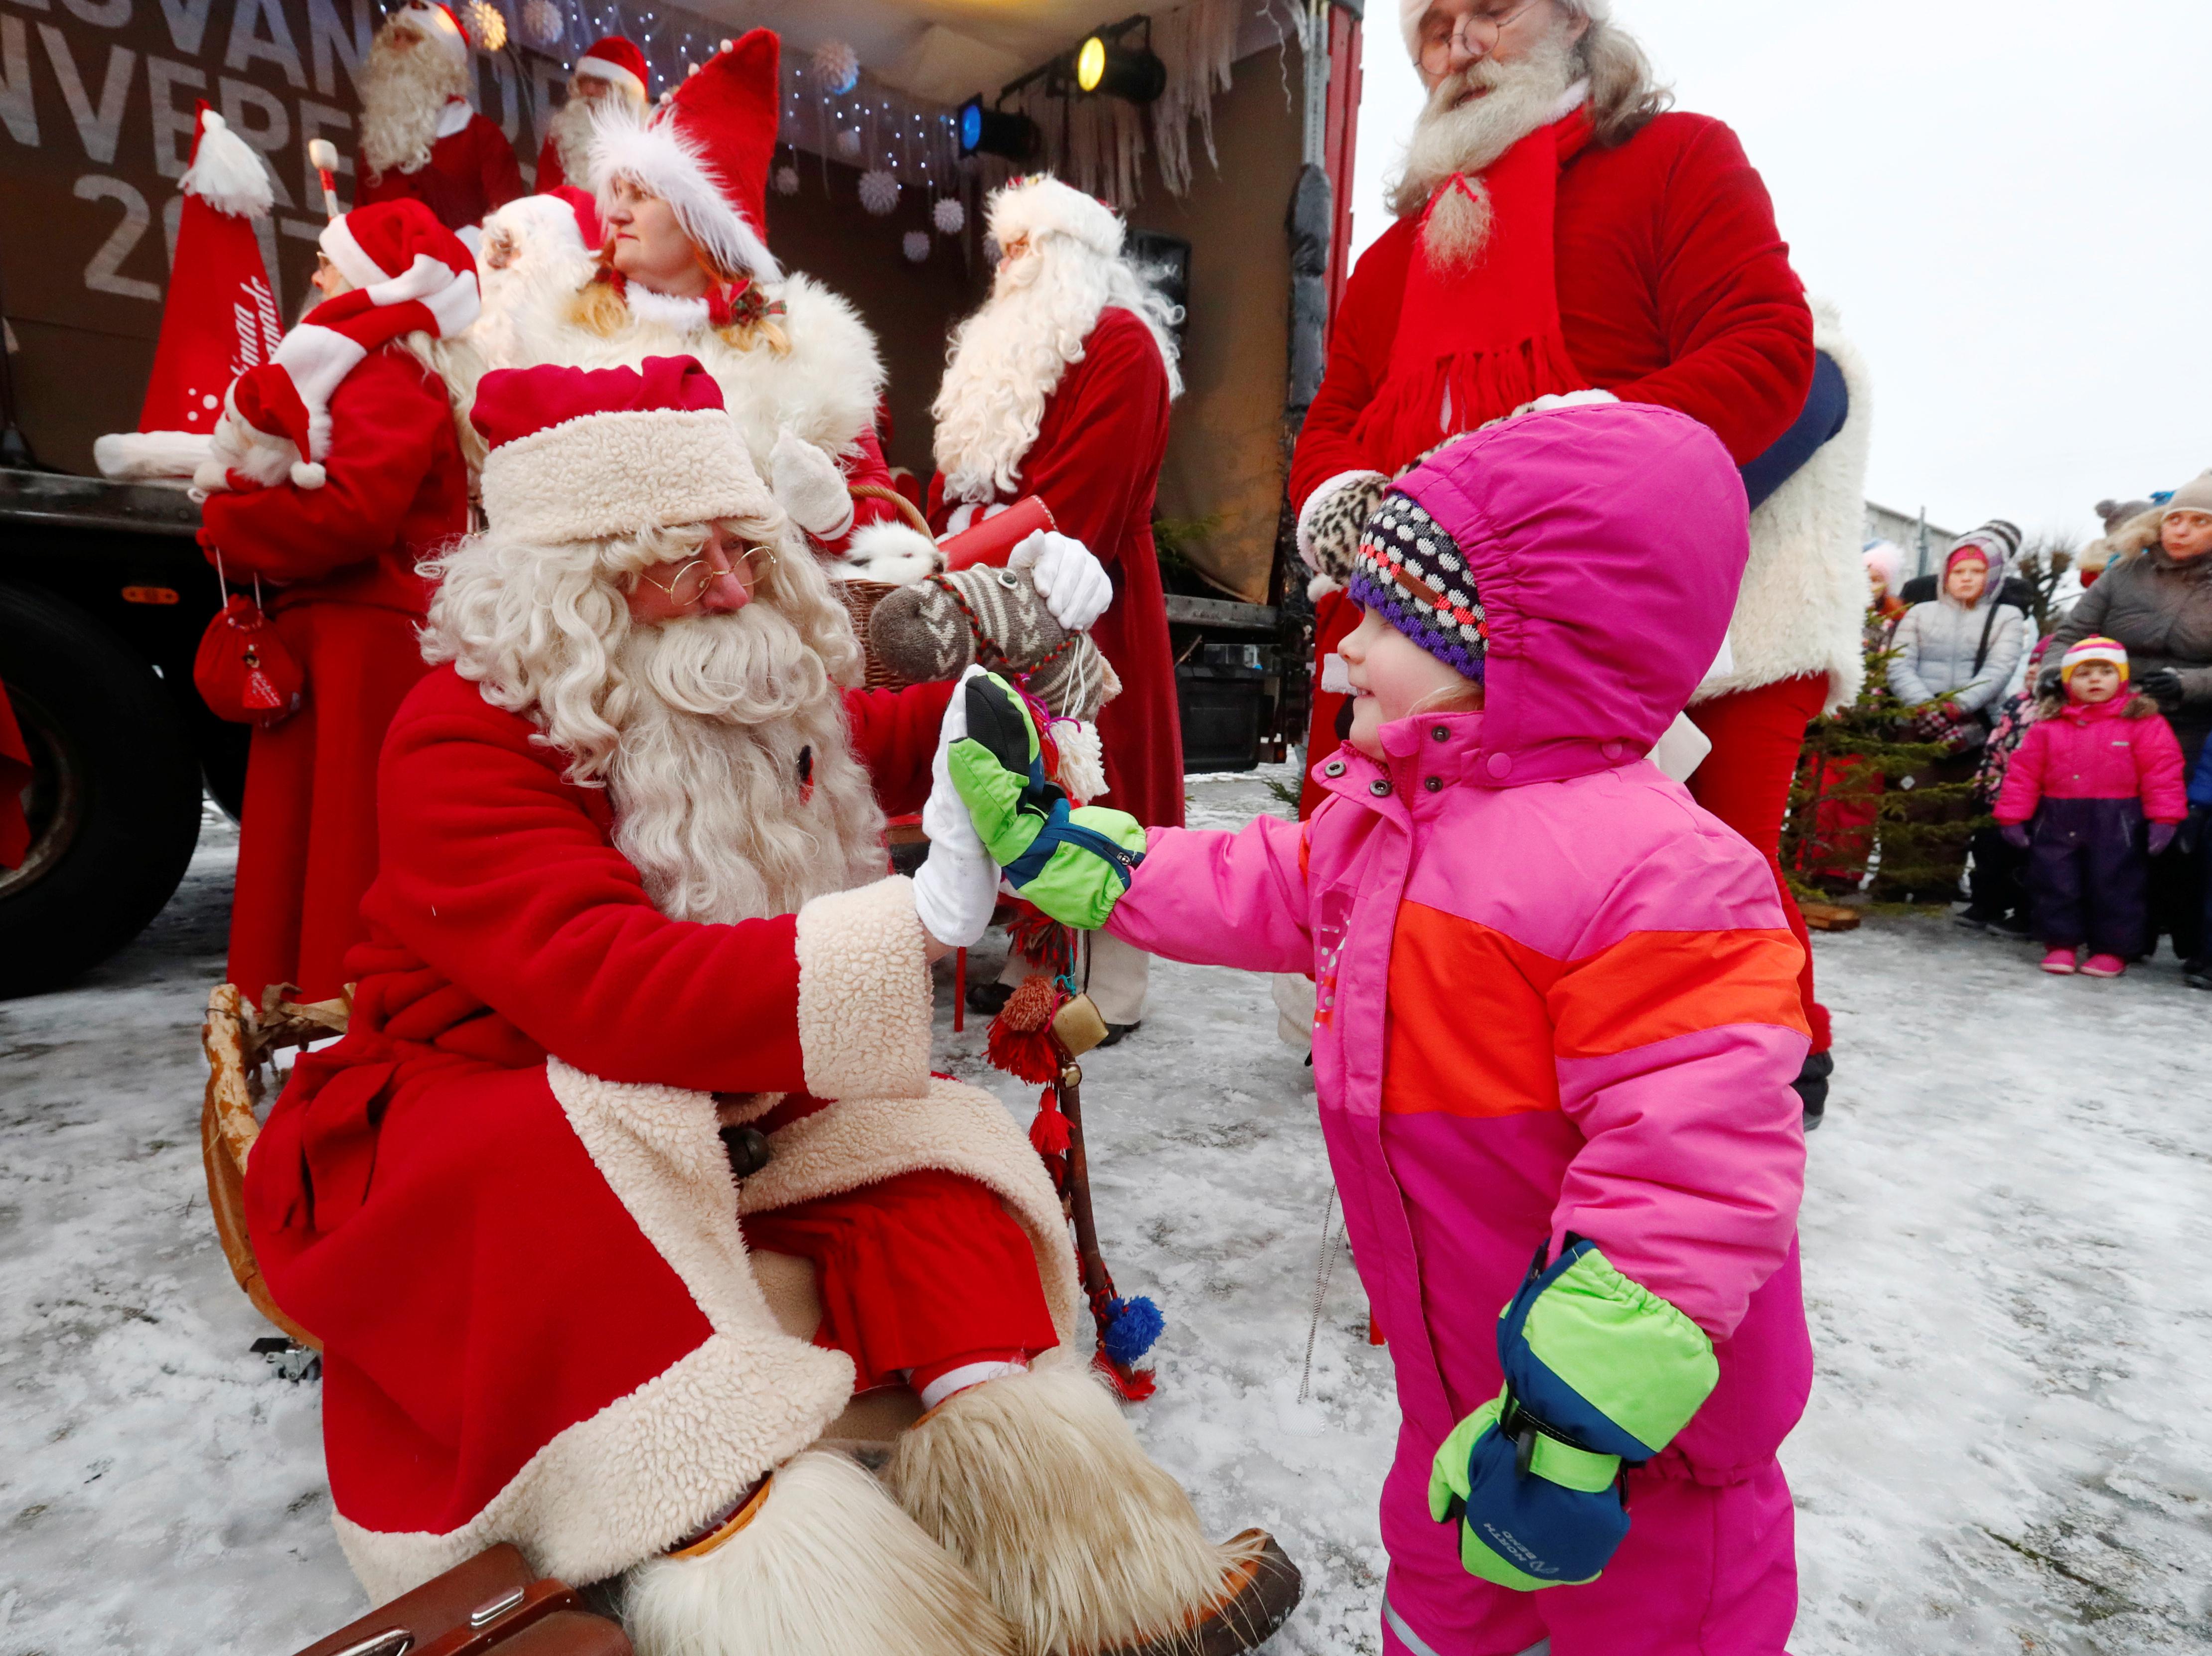 مواطنون يرتدون سانتا كلوز